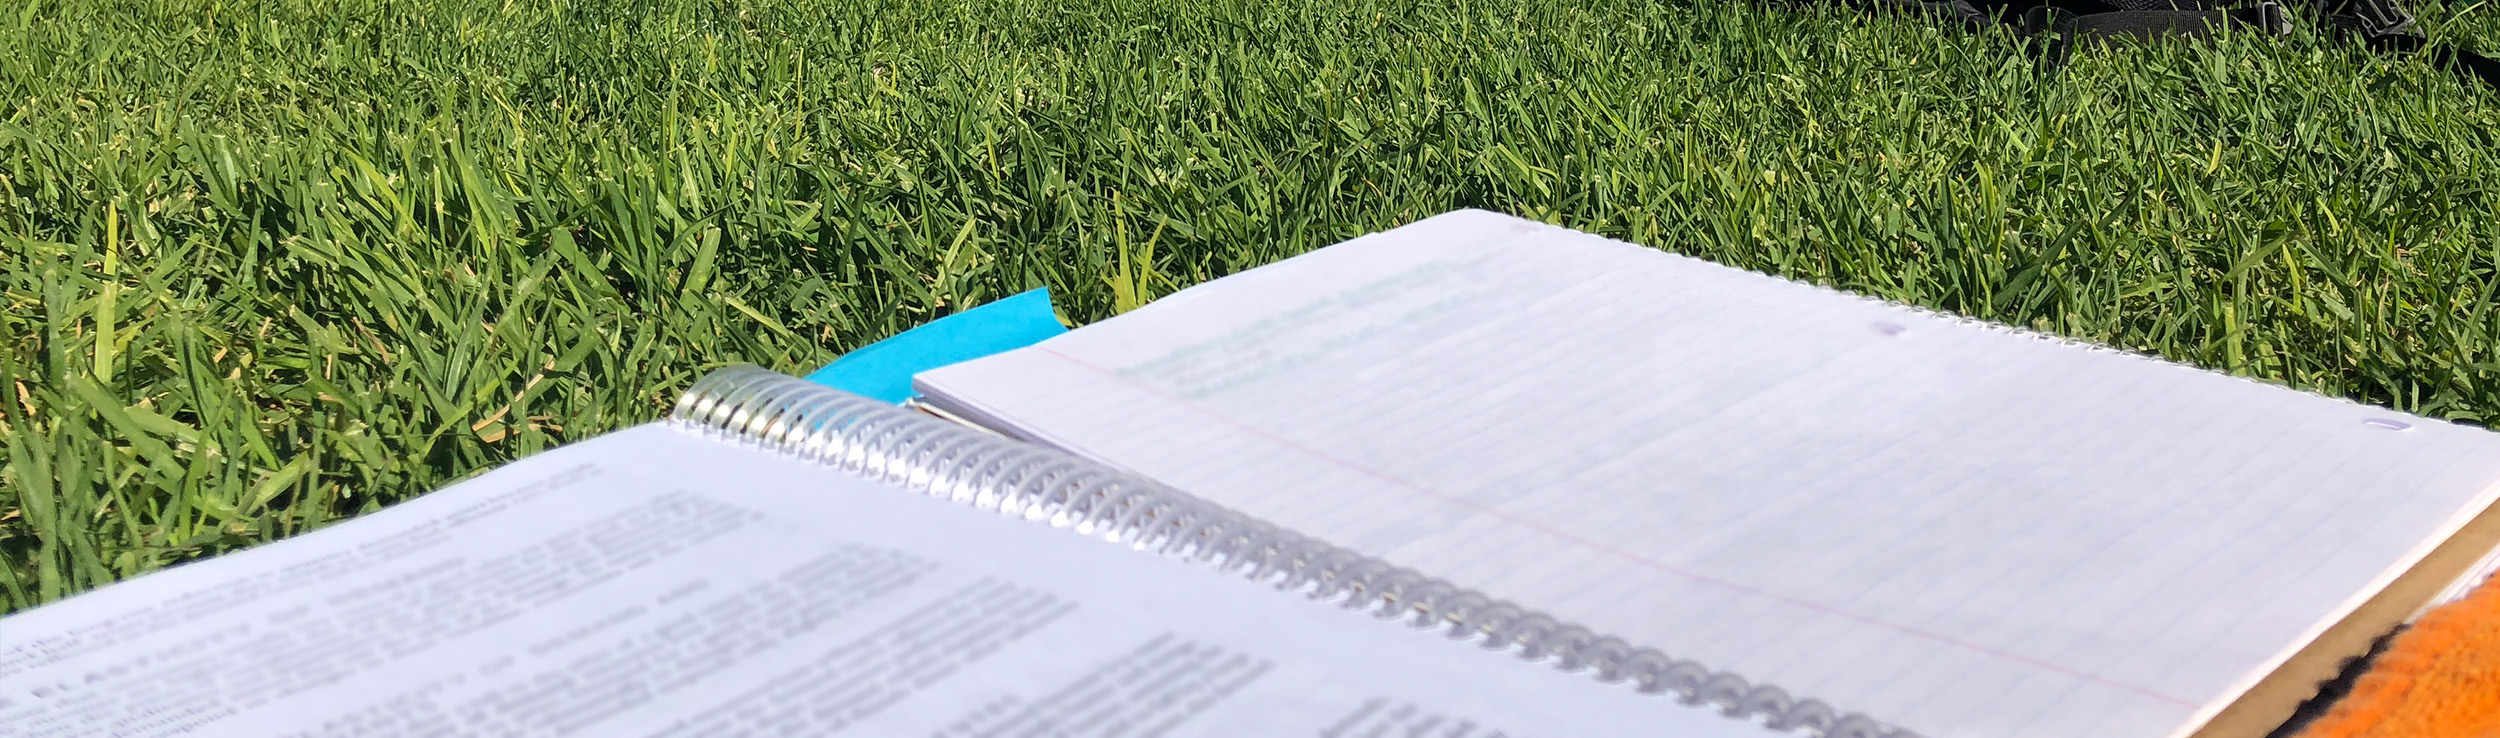 UEBT annual reports -